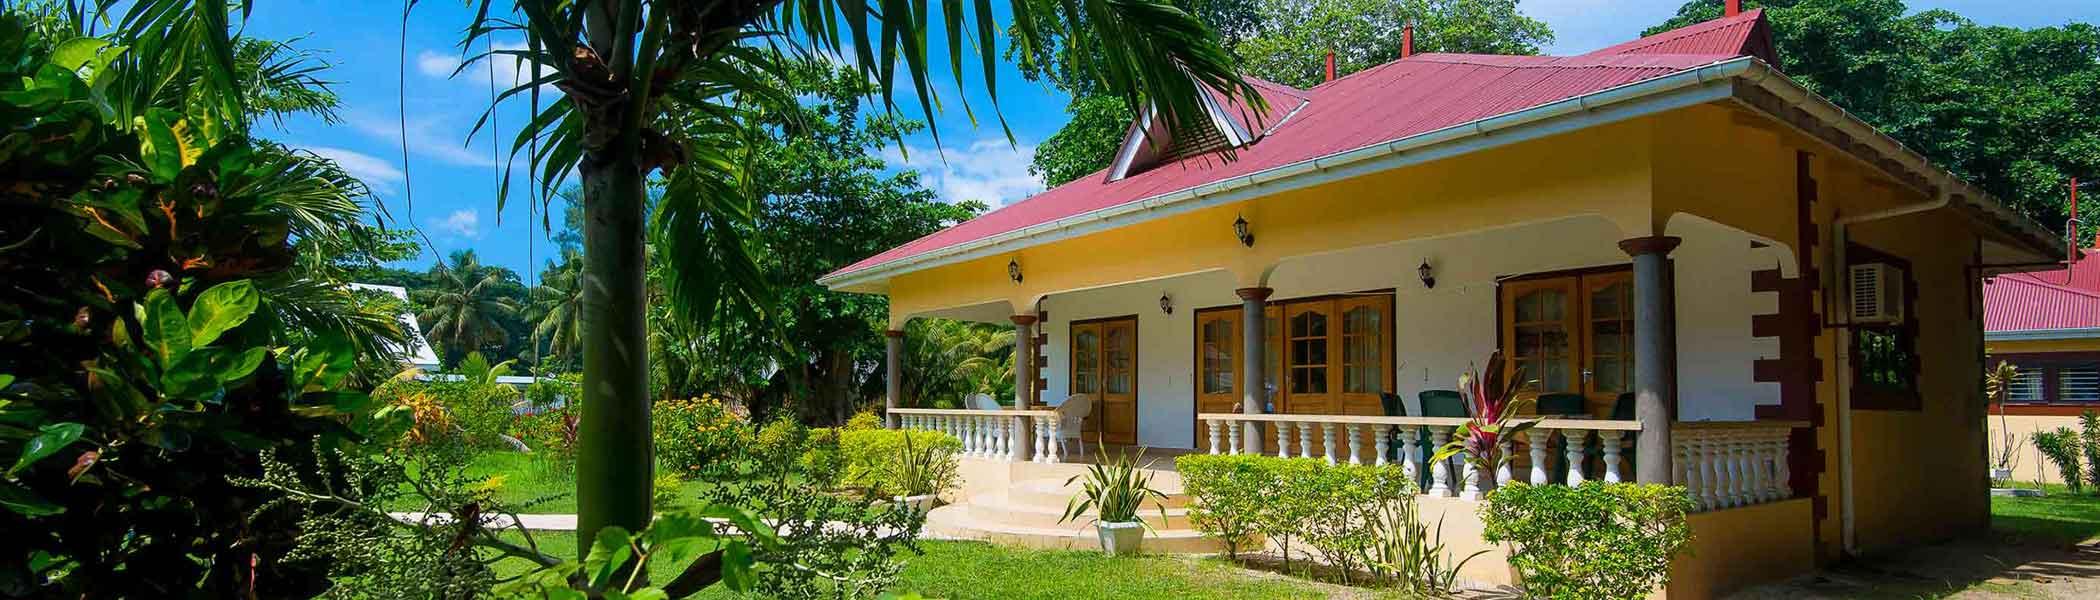 zerof-apartments, Self Caterings in Seychelles Islands